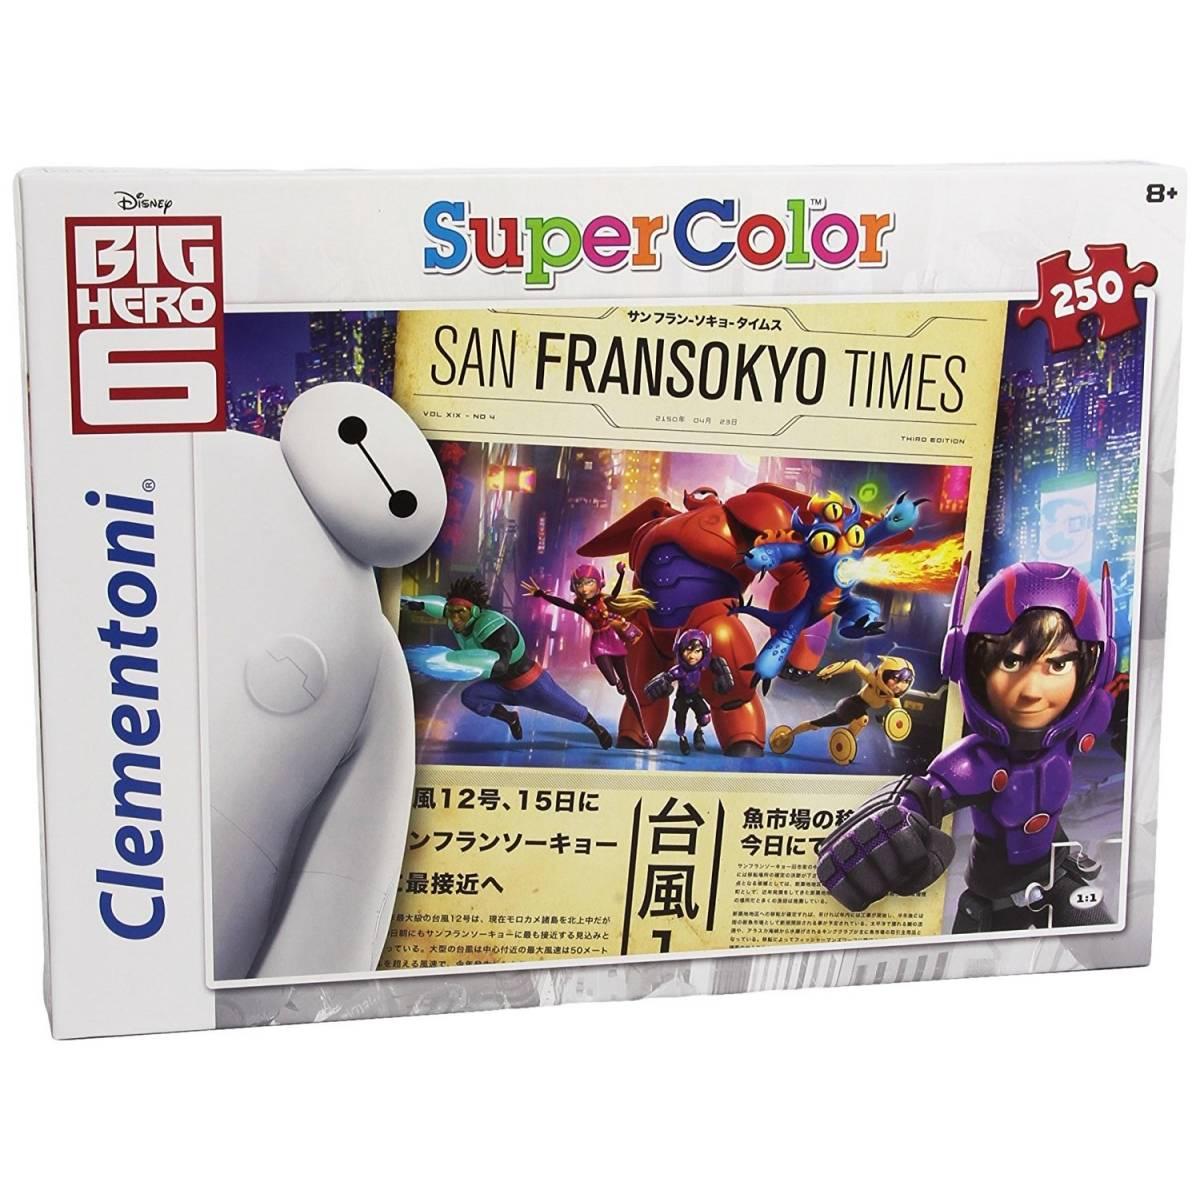 Clementoni - Puzzle Big Hero 6 - Good News - 250 Pièces